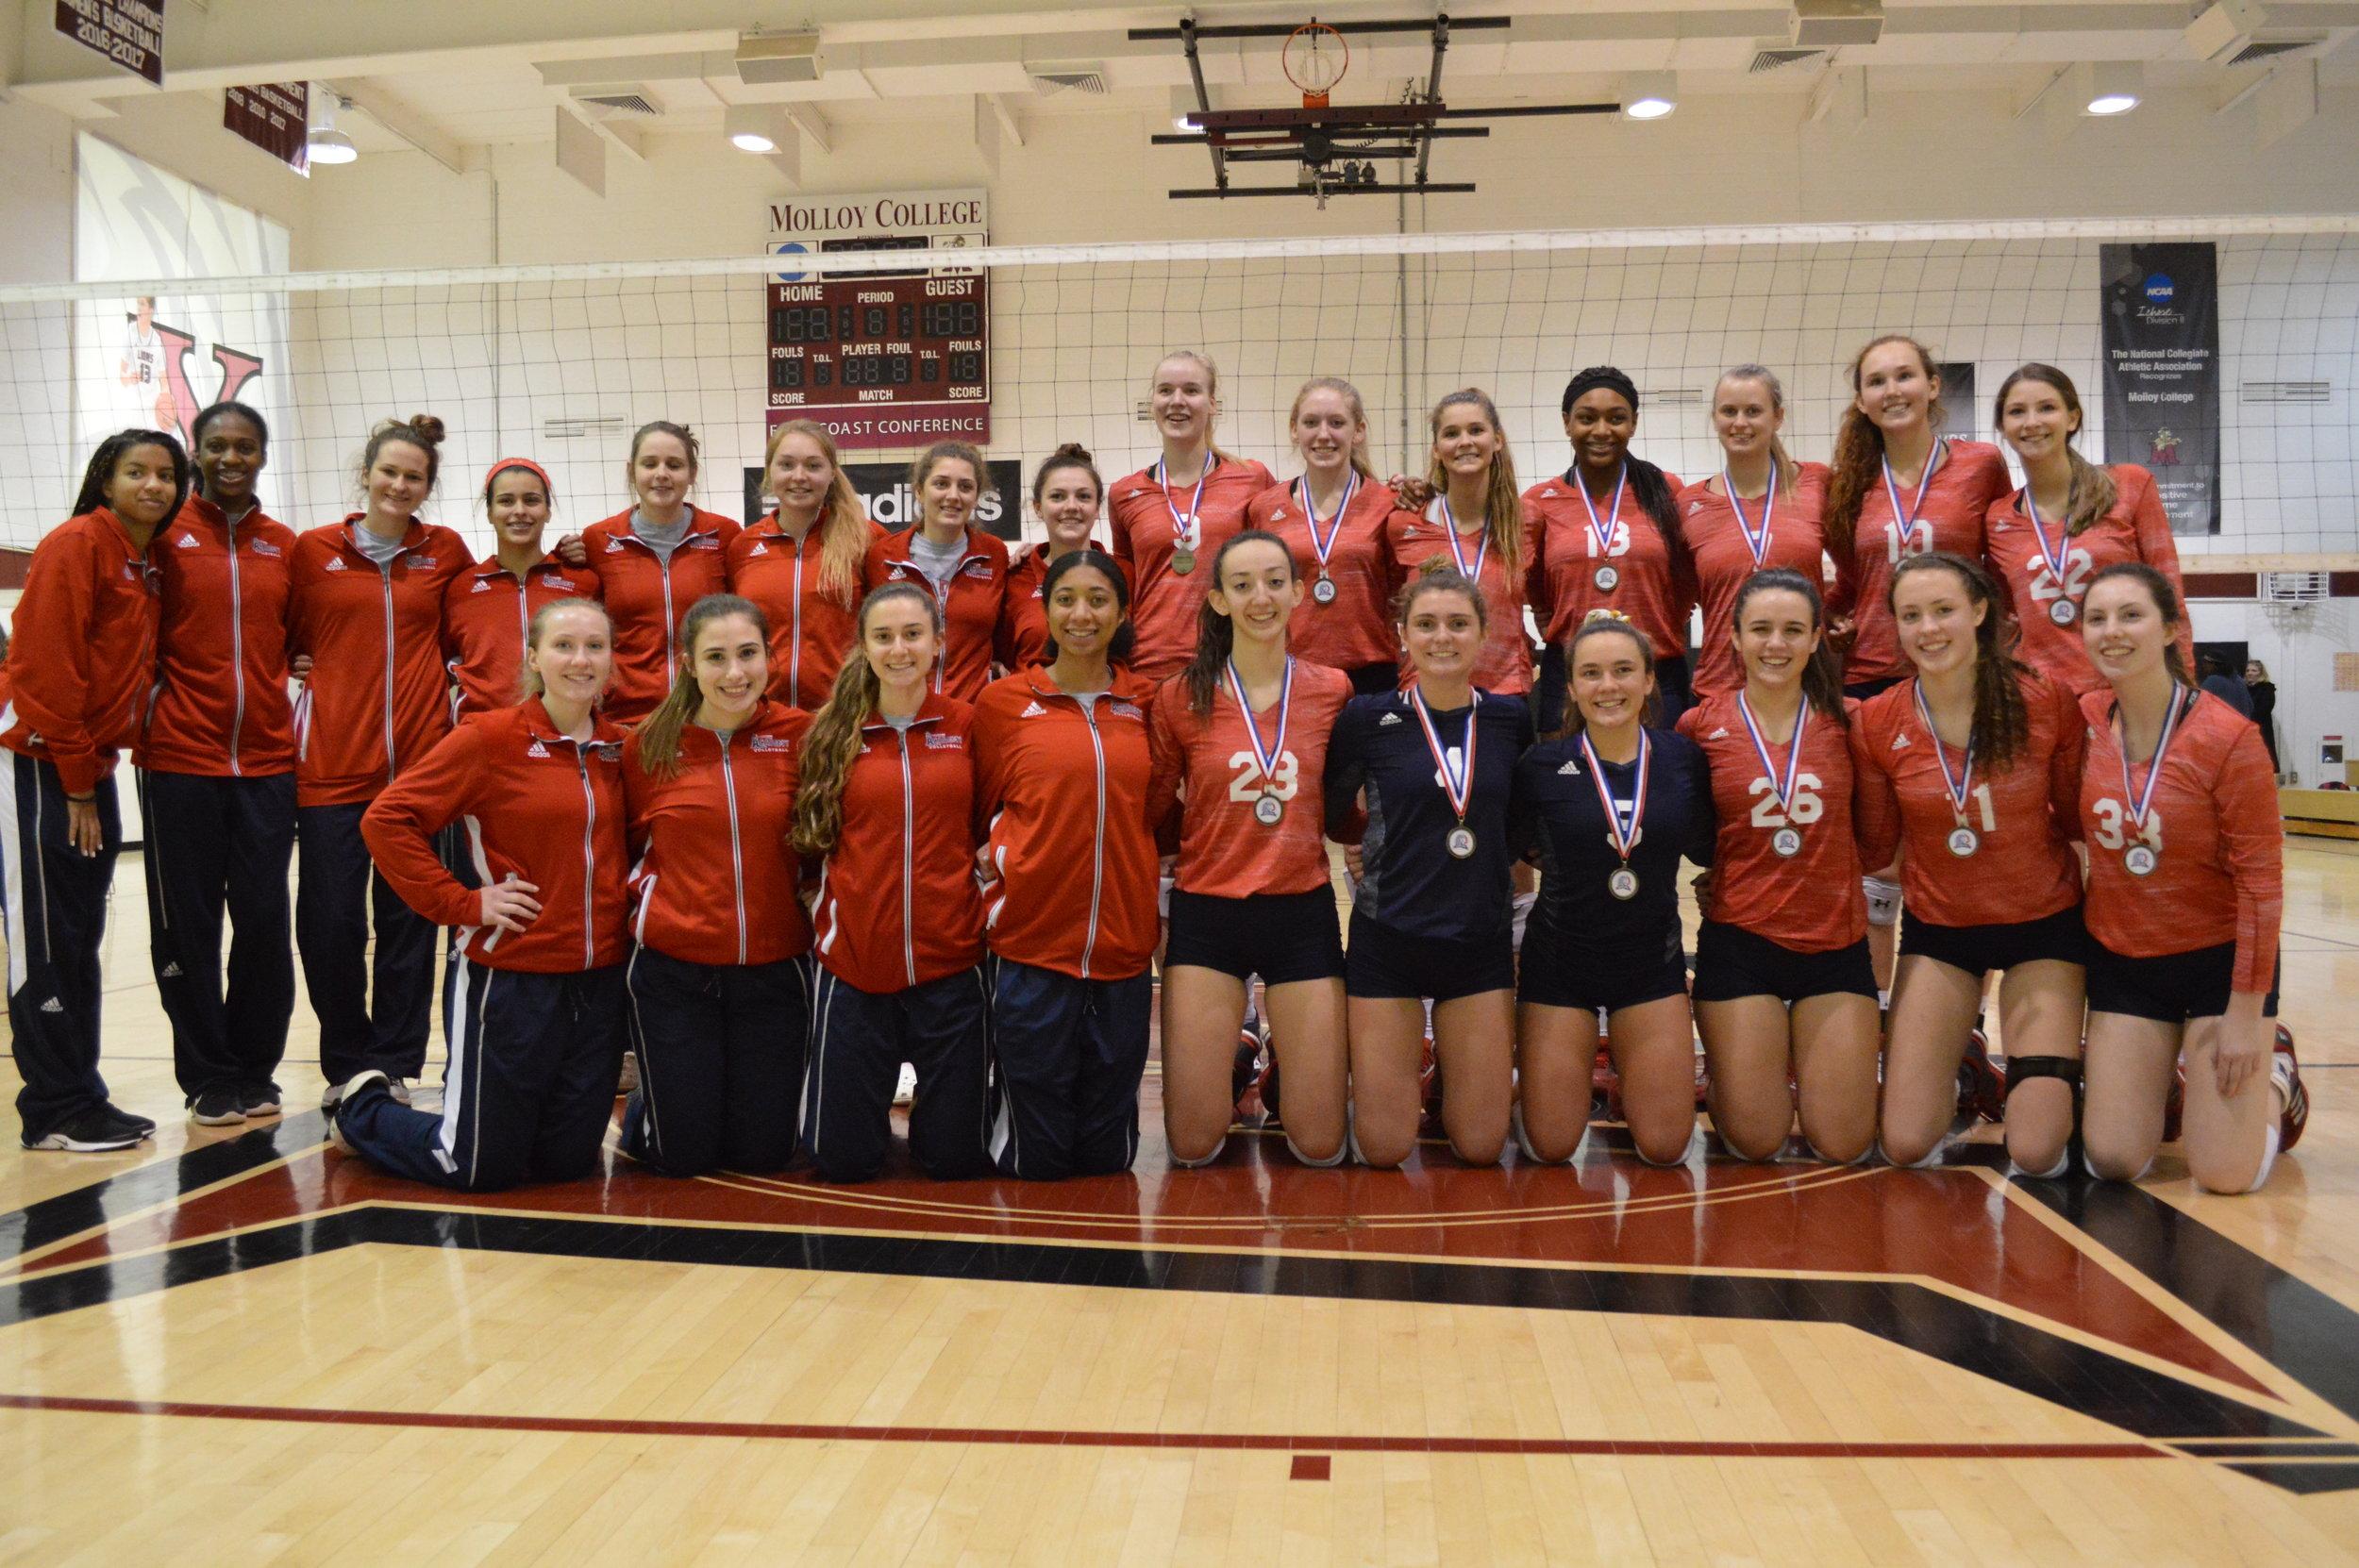 2018 Accomplishments Academy Volleyball